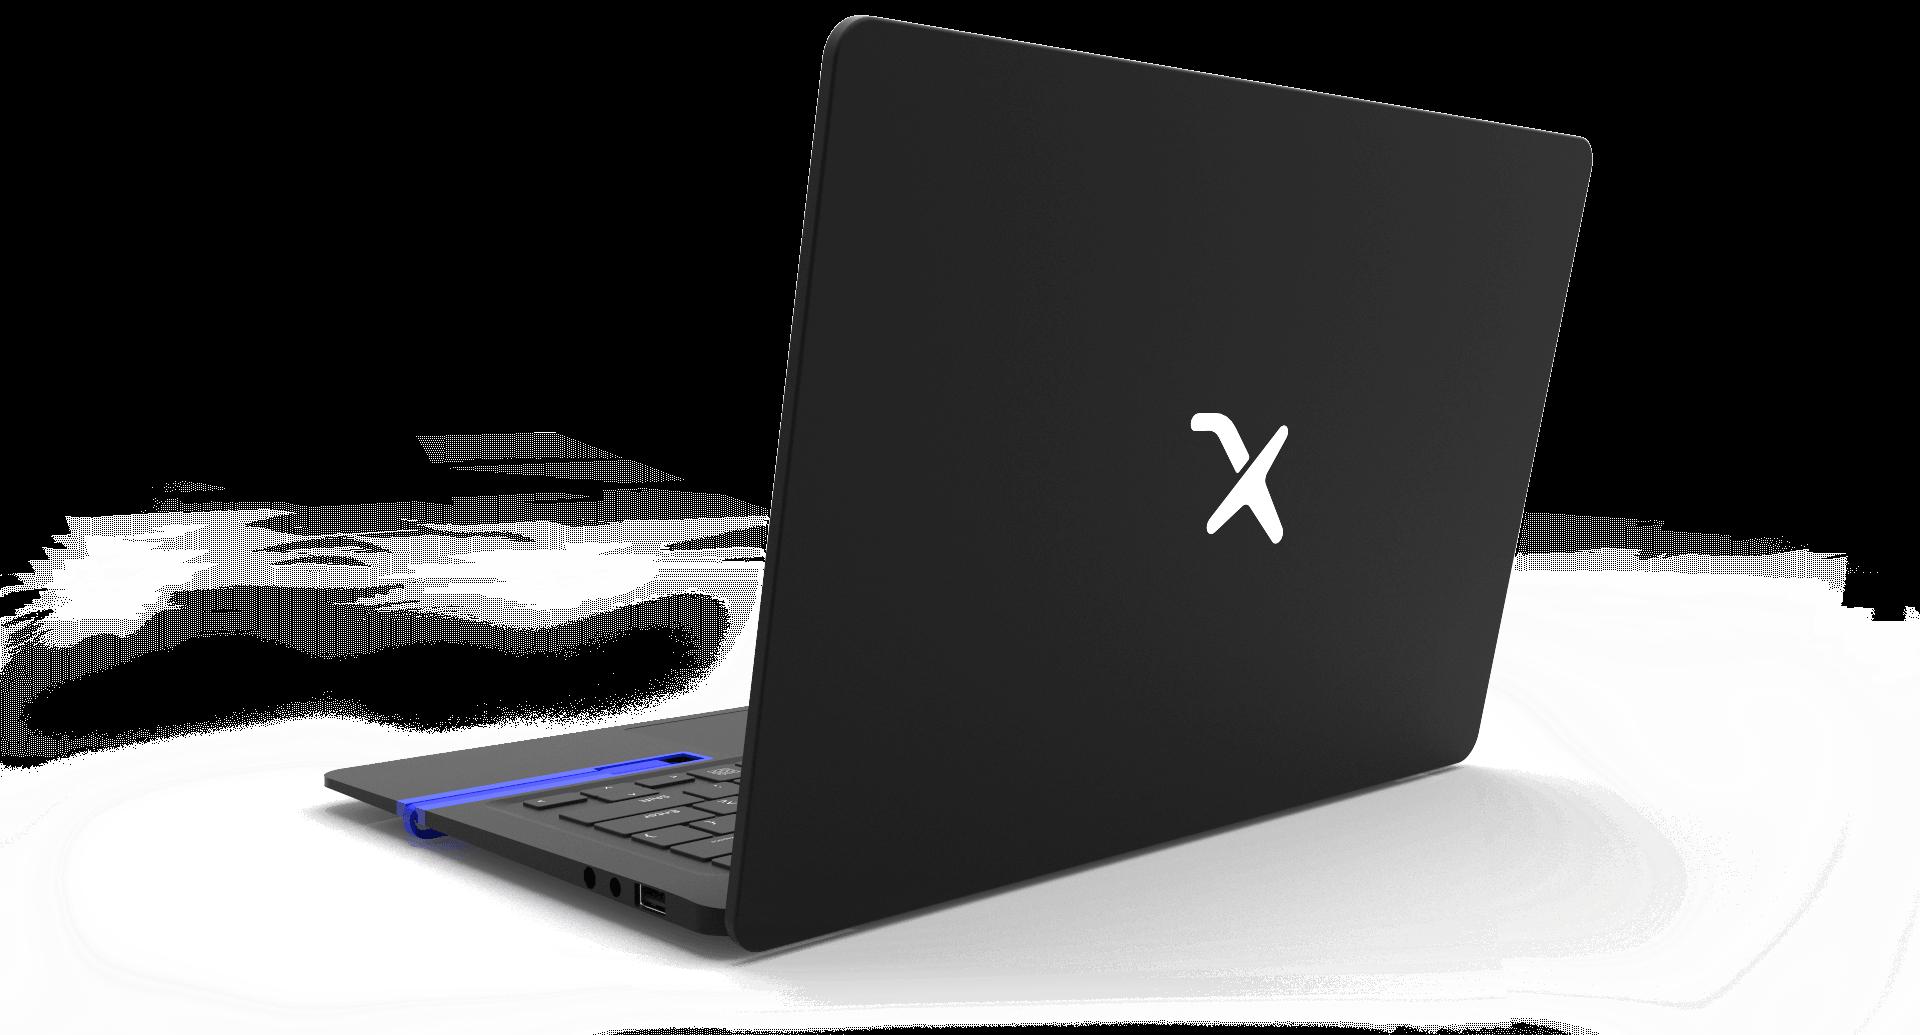 Laptop clipart windows keyboard, Laptop windows keyboard.